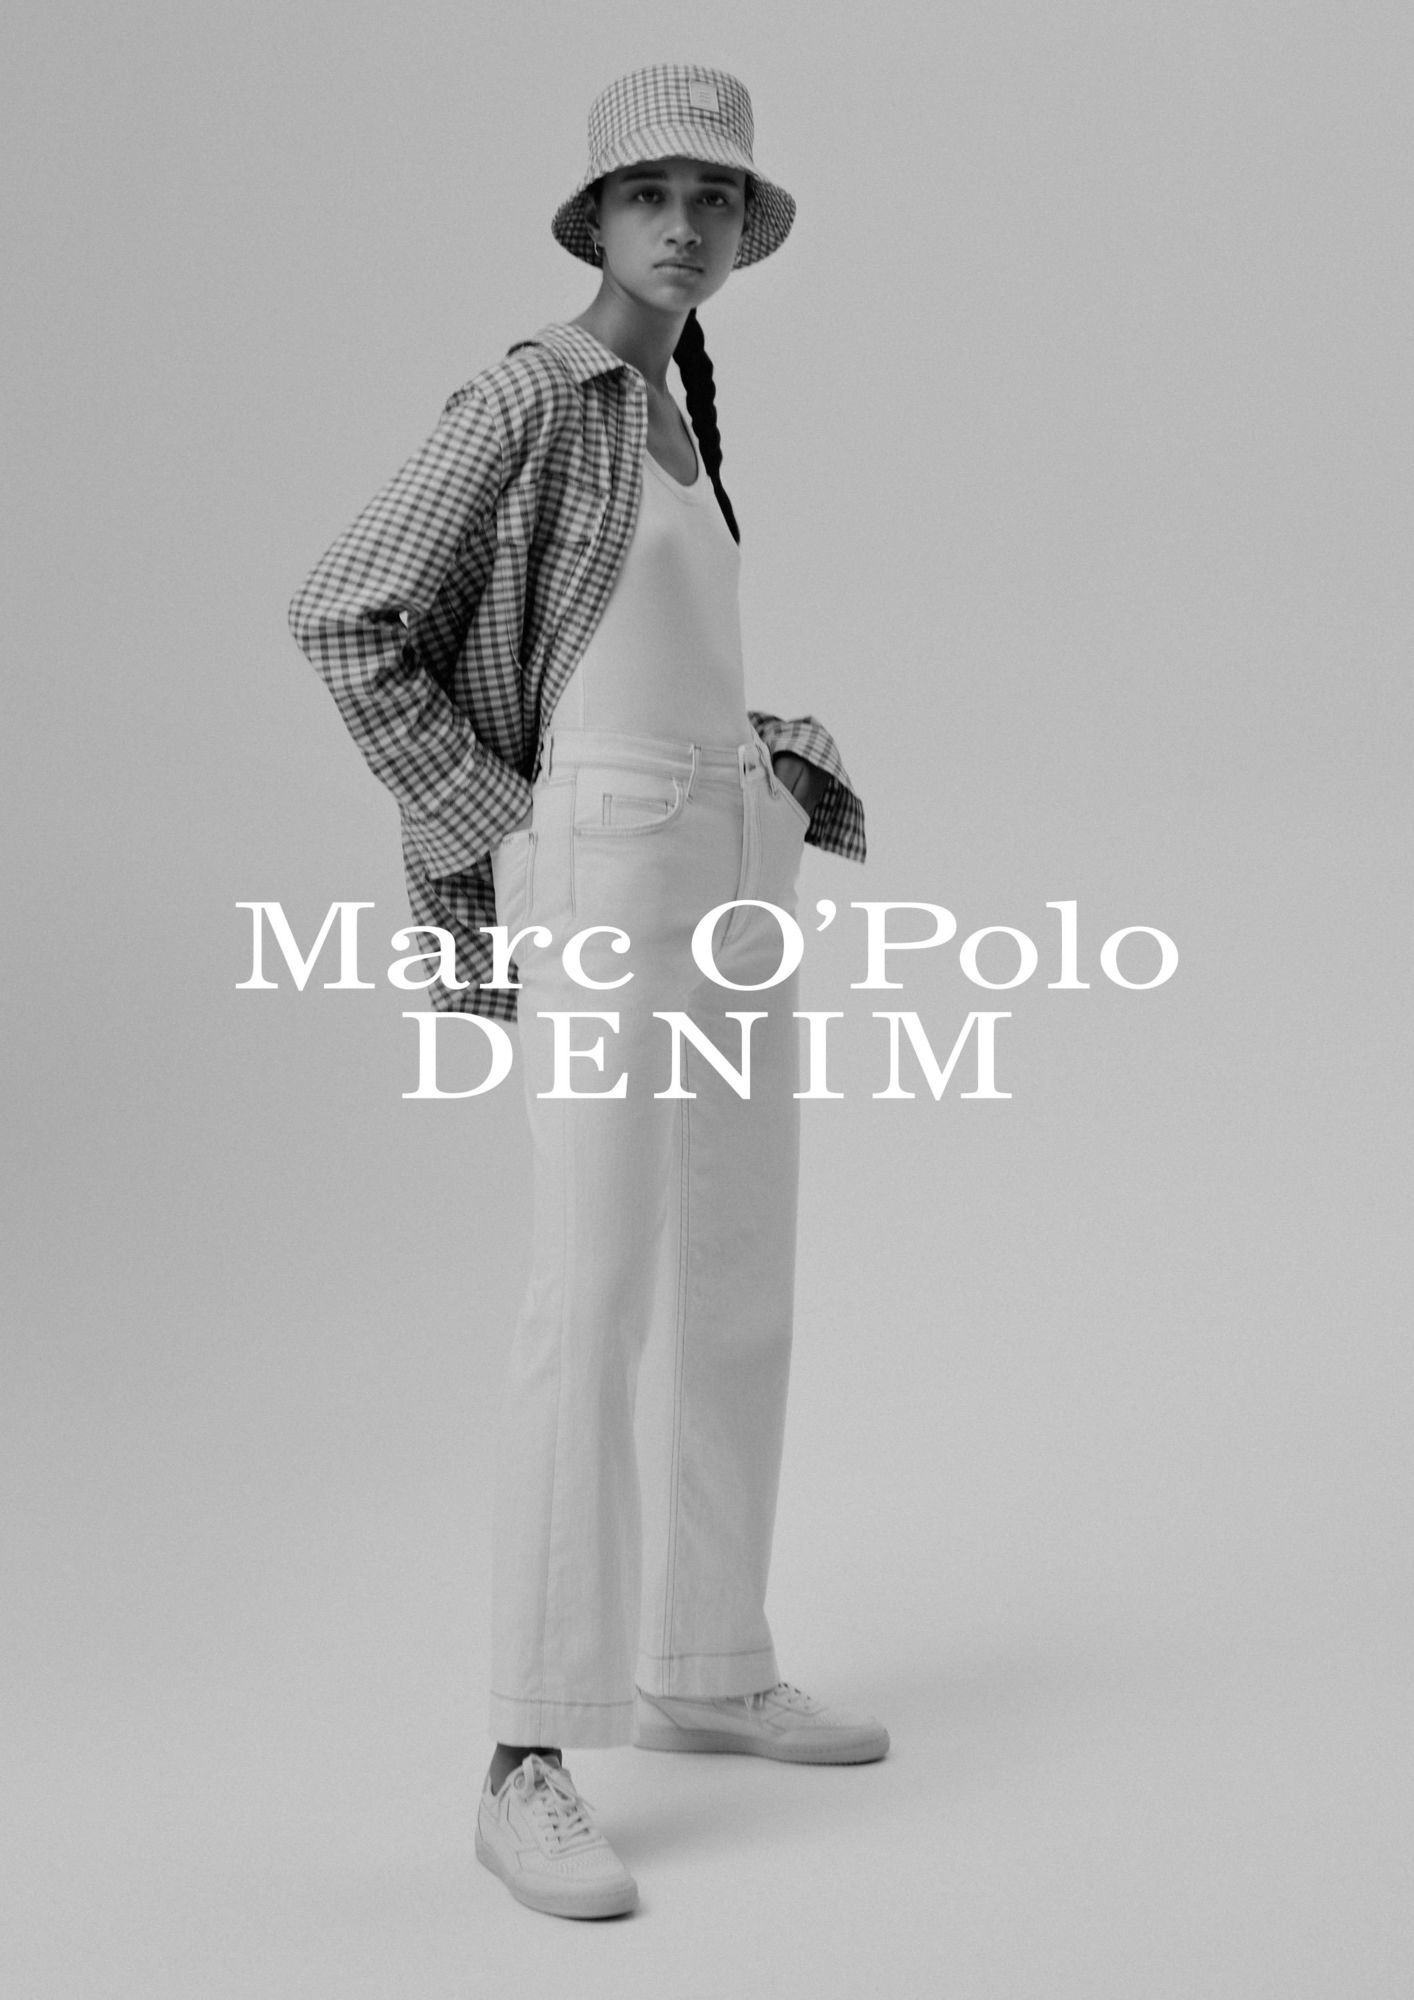 BLINK IMAGING   BILLY BALLARD   MARC O'POLO DENIM